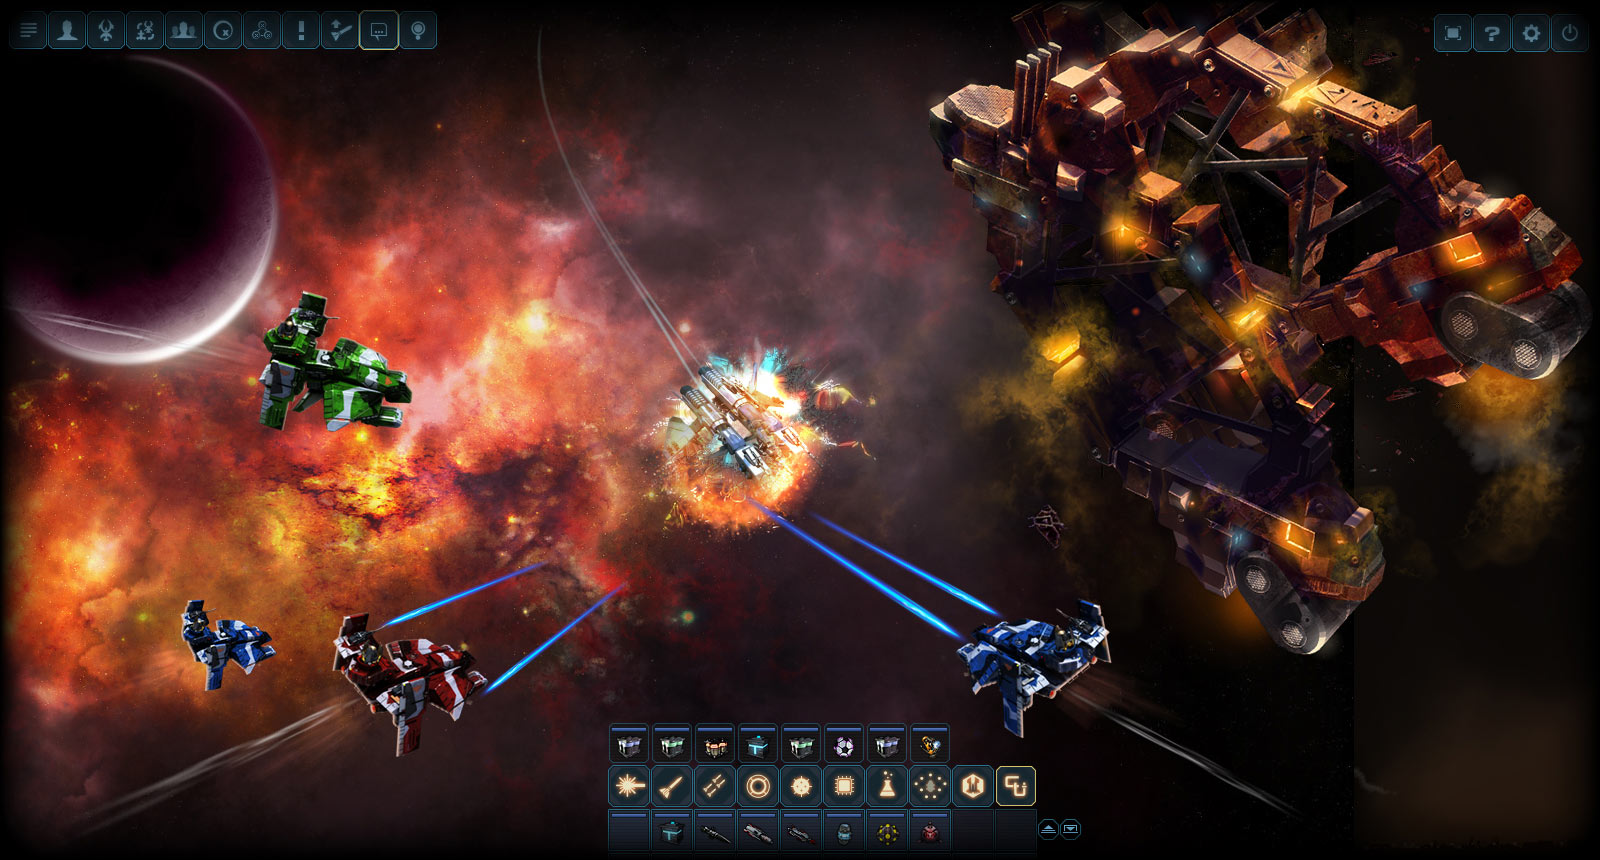 DarkOrbit Reloaded screen shot